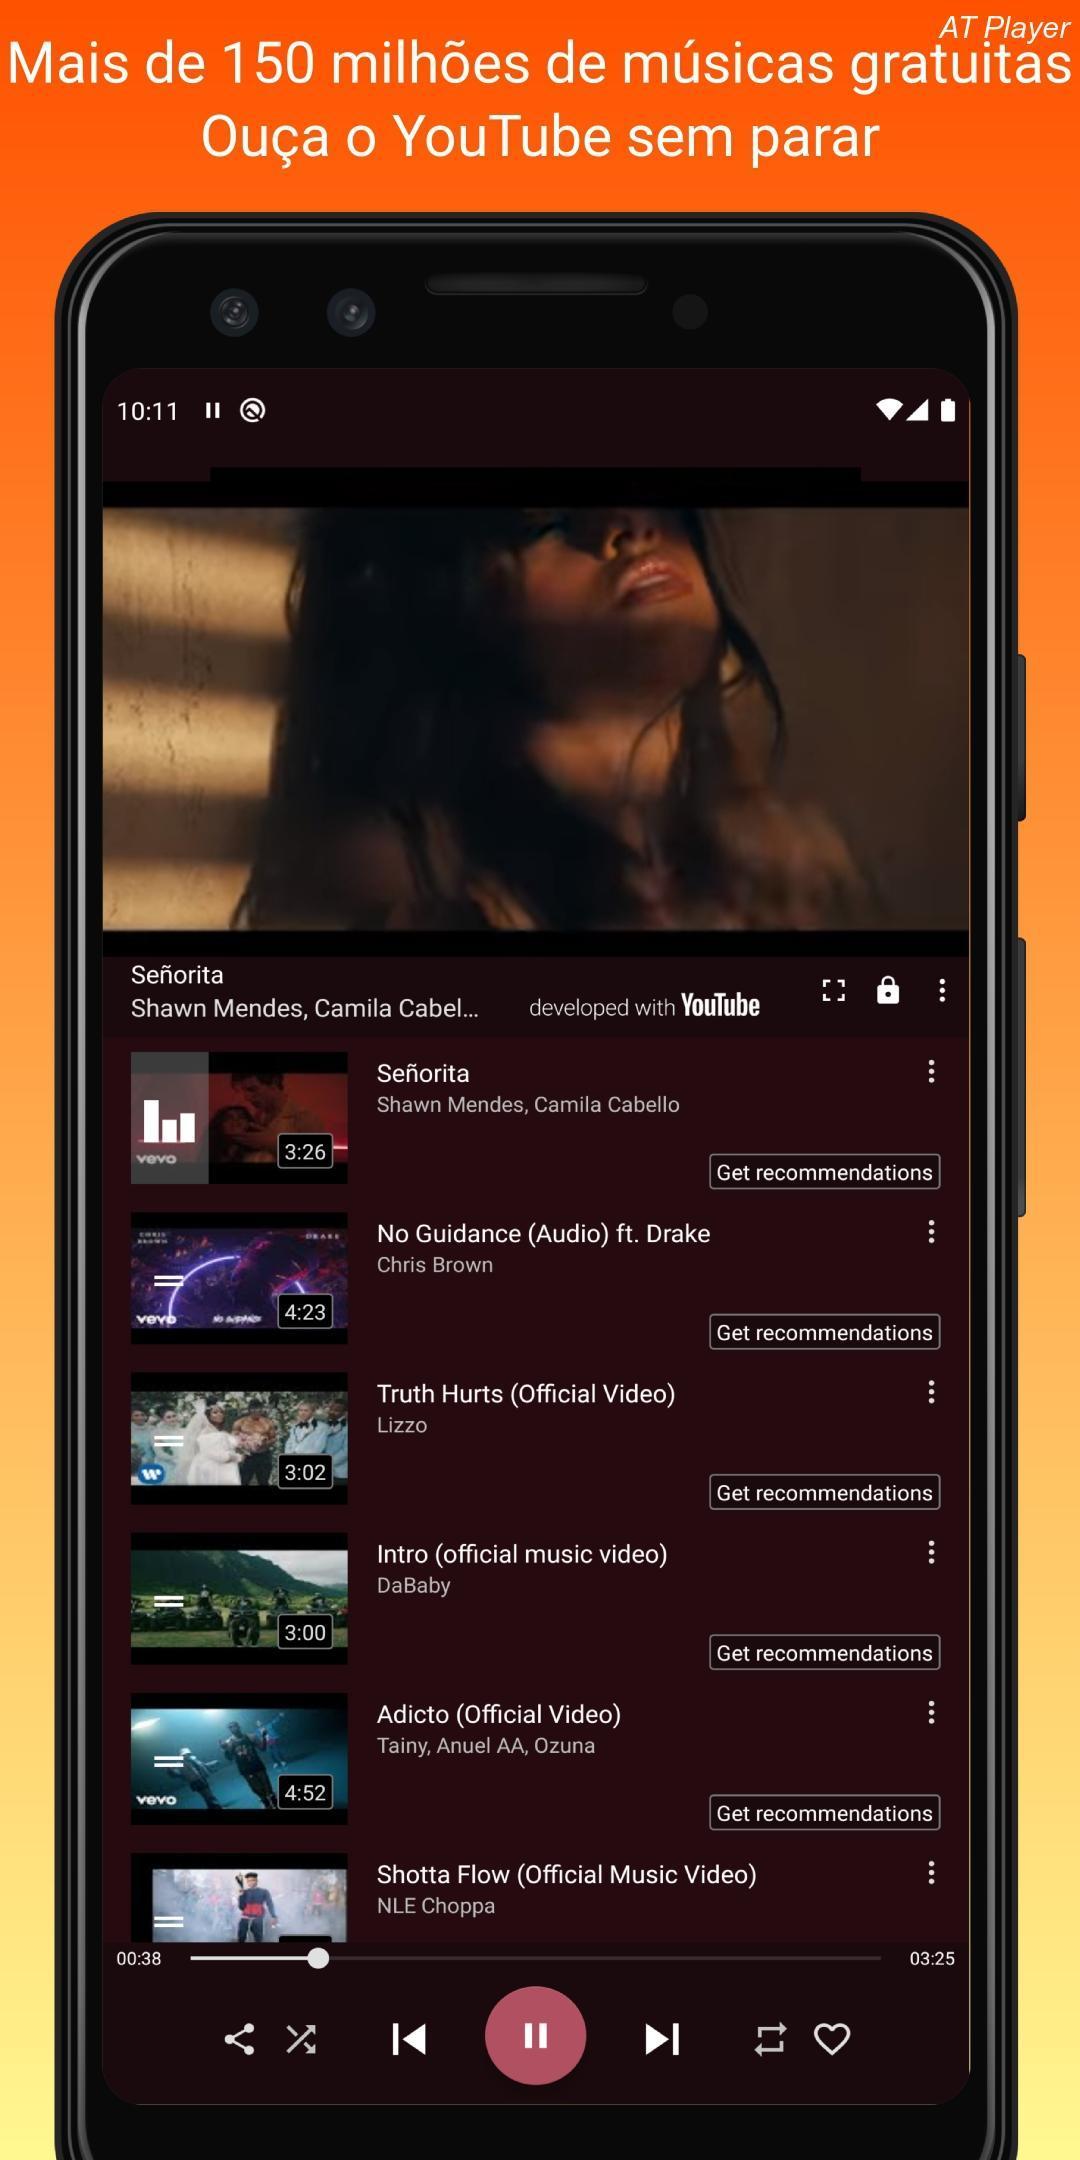 Baixar Musicas Gratis Youtube Musicas Player Mp3 Para Android Apk Baixar